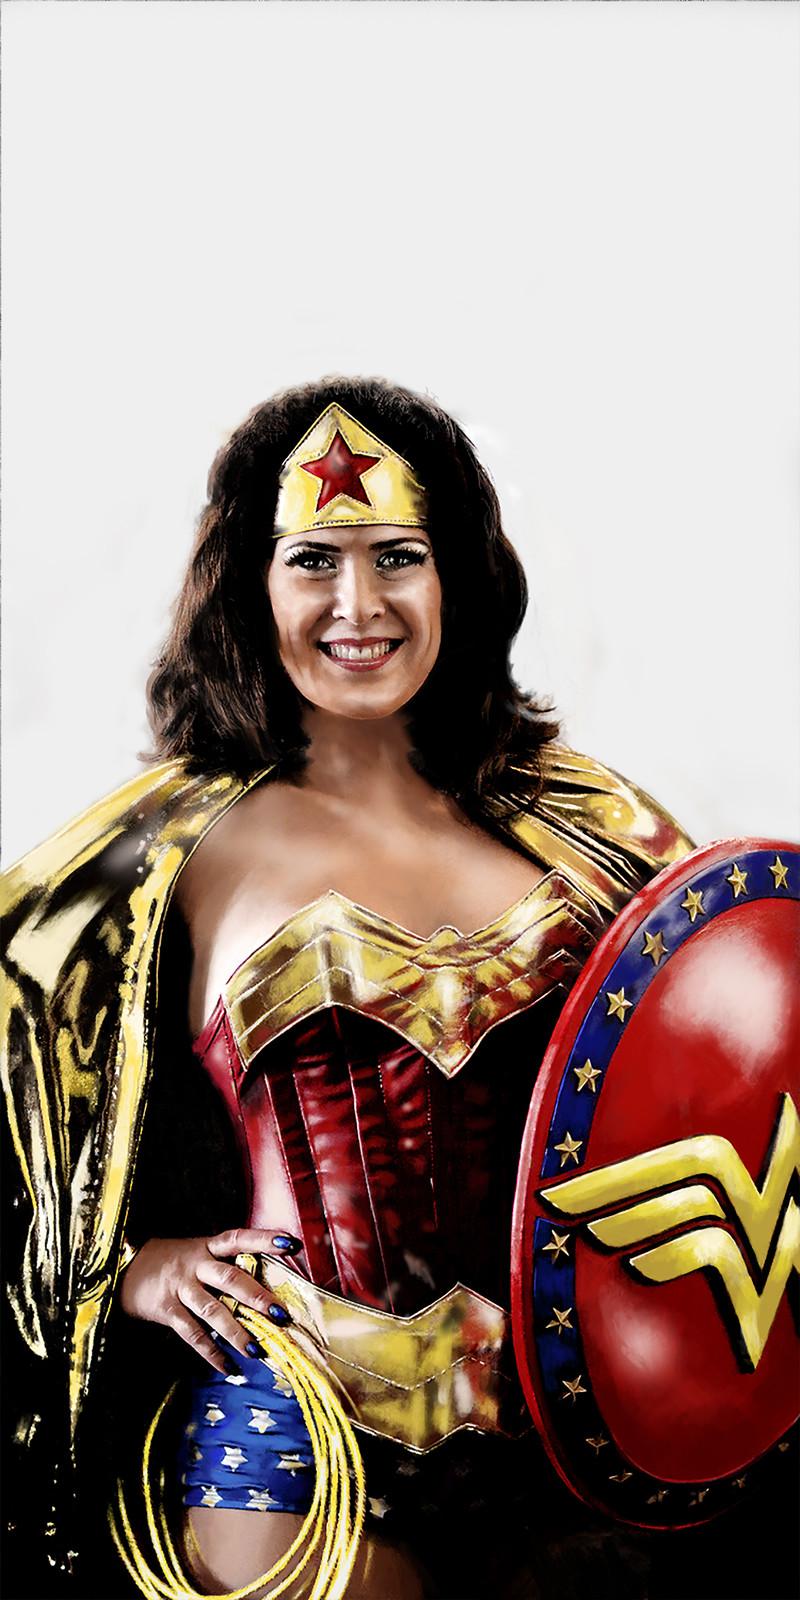 Wonder Woman portrait series using my favorite model.